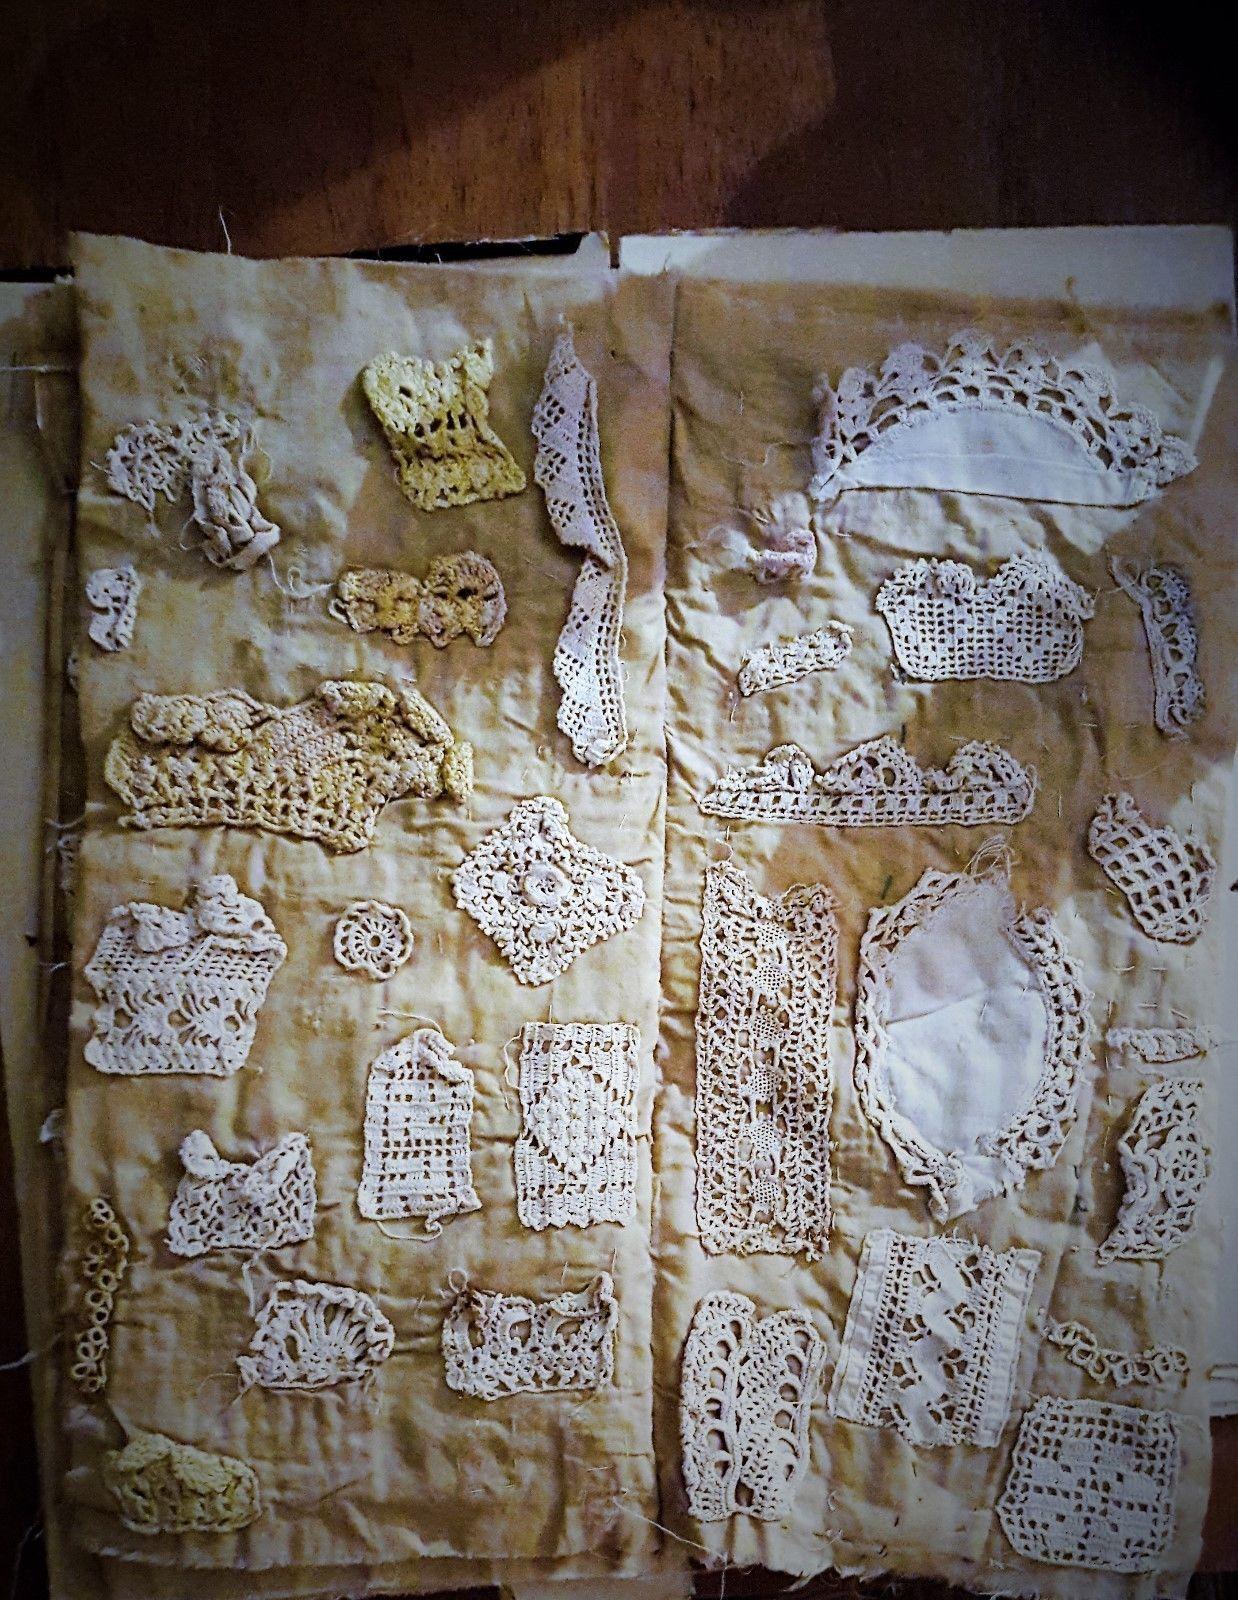 Rare Antique Hand Made Lace Needlework Crochet Sampler